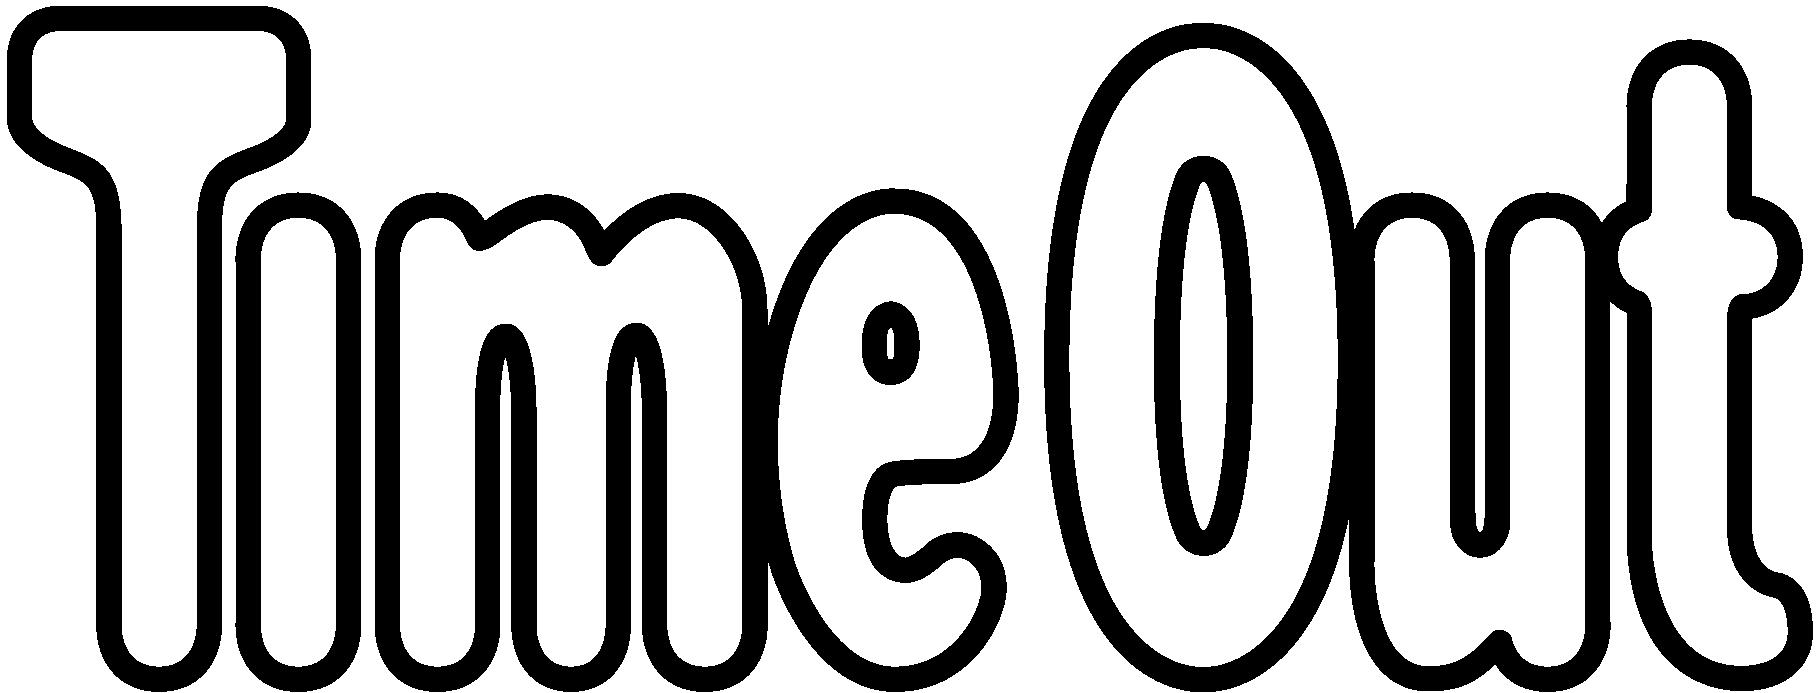 timeout_logo.png